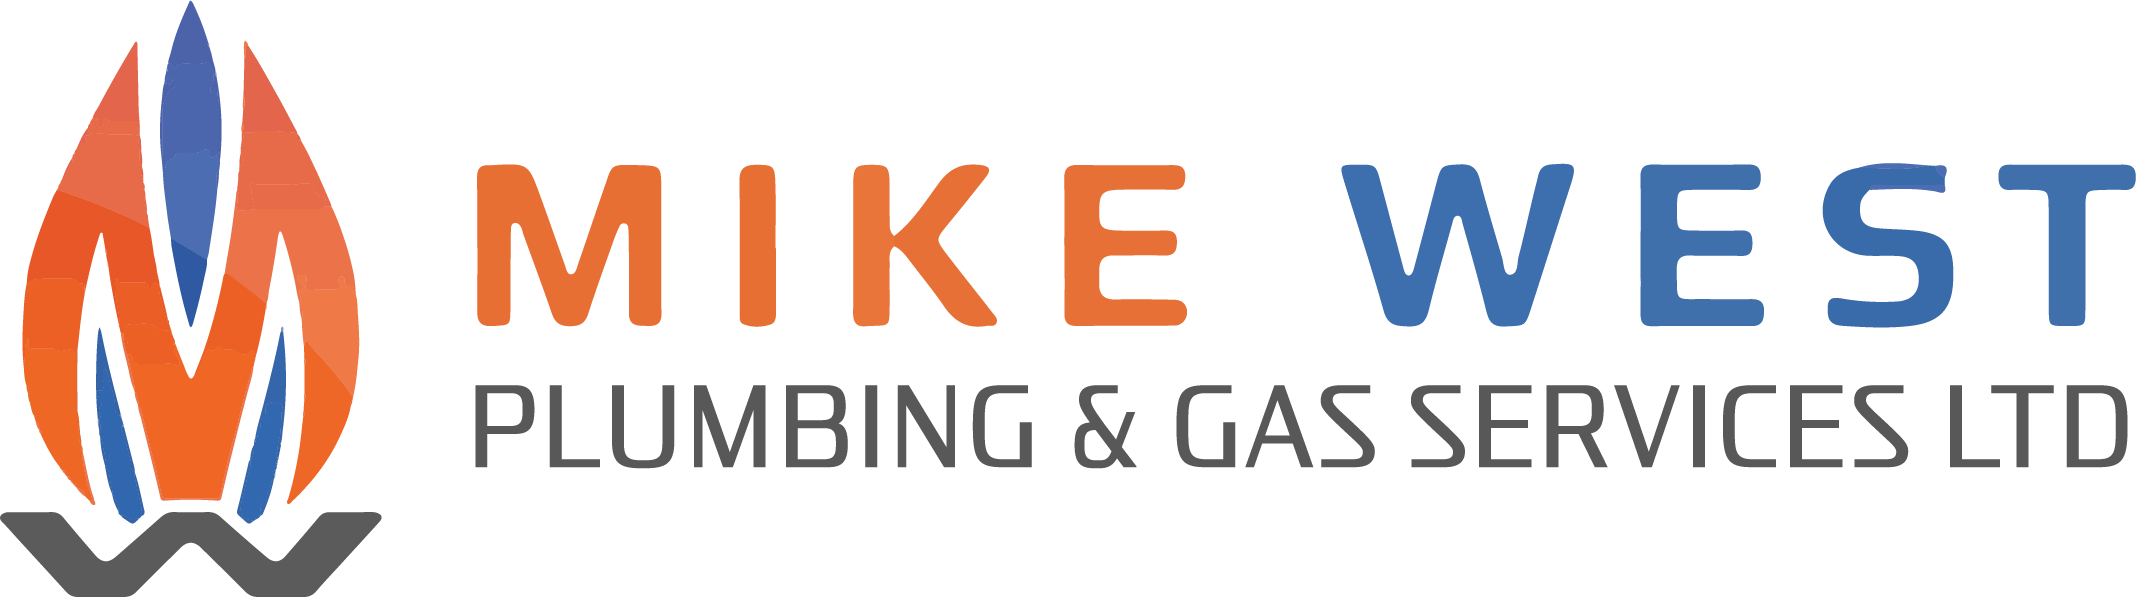 Mike West Plumbing & Gas Servicing Ltd